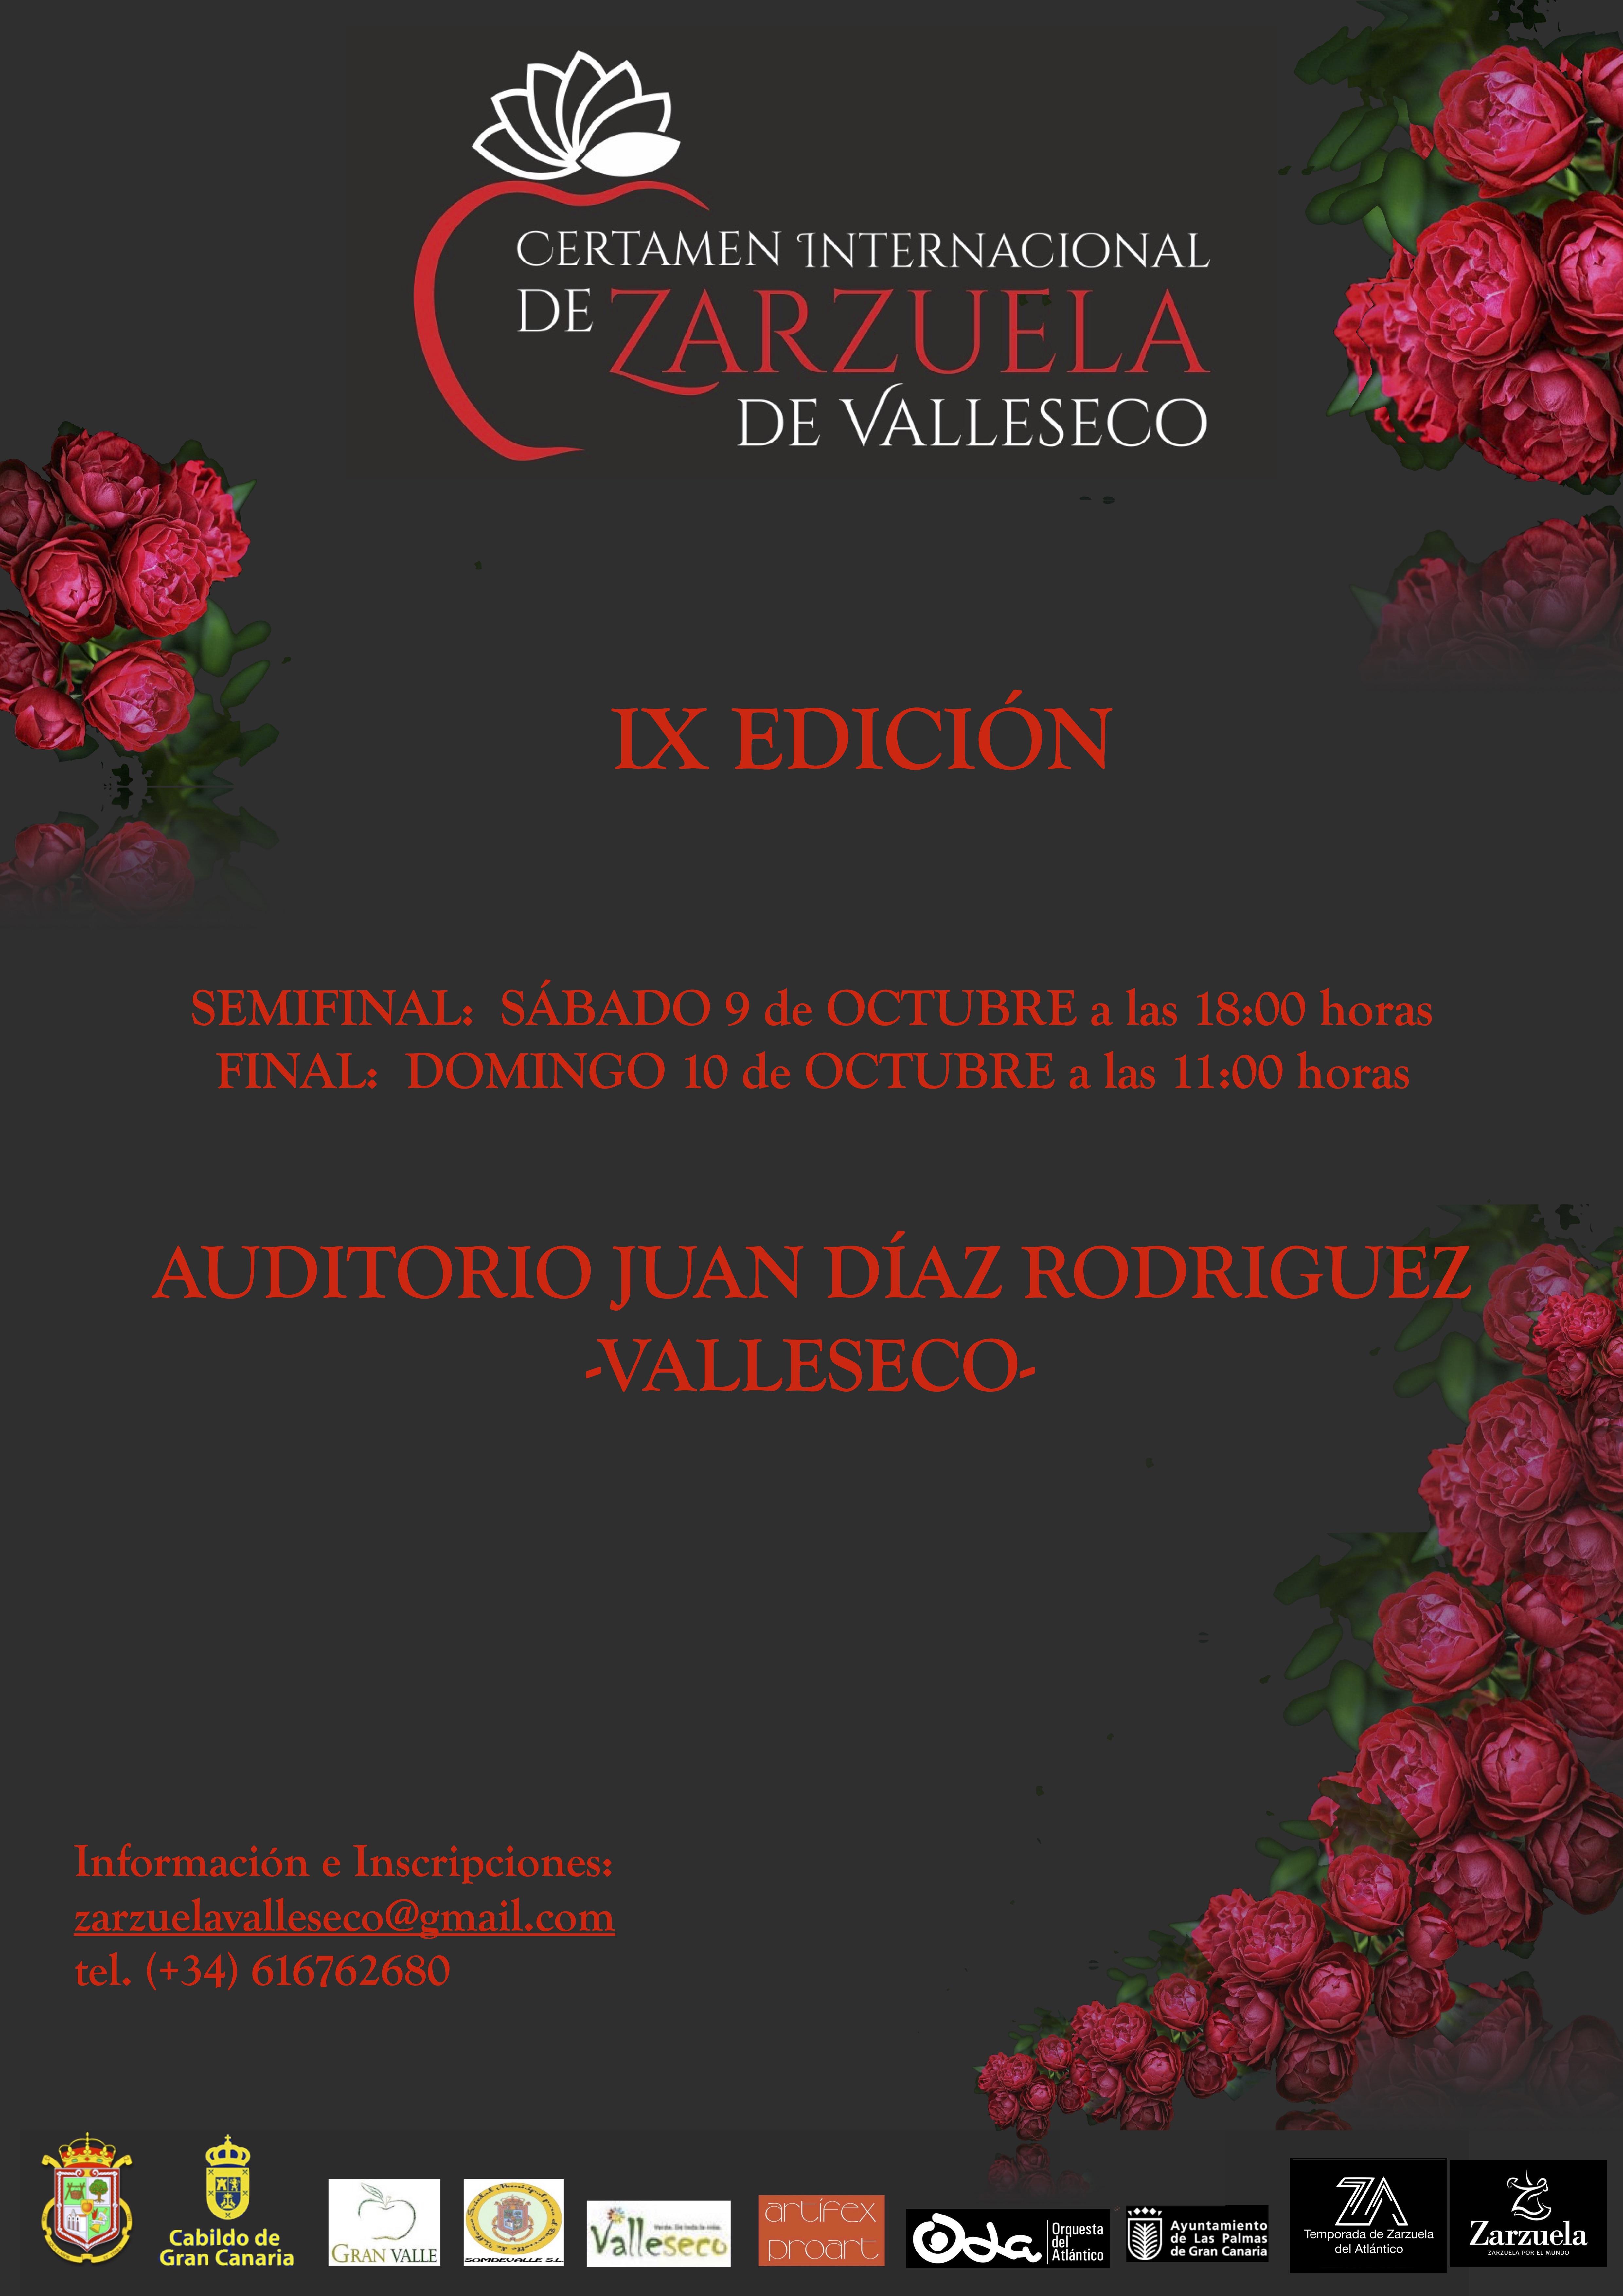 IX Certamen Internacional de Zarzuela de Valleseco/ canariasnoticias